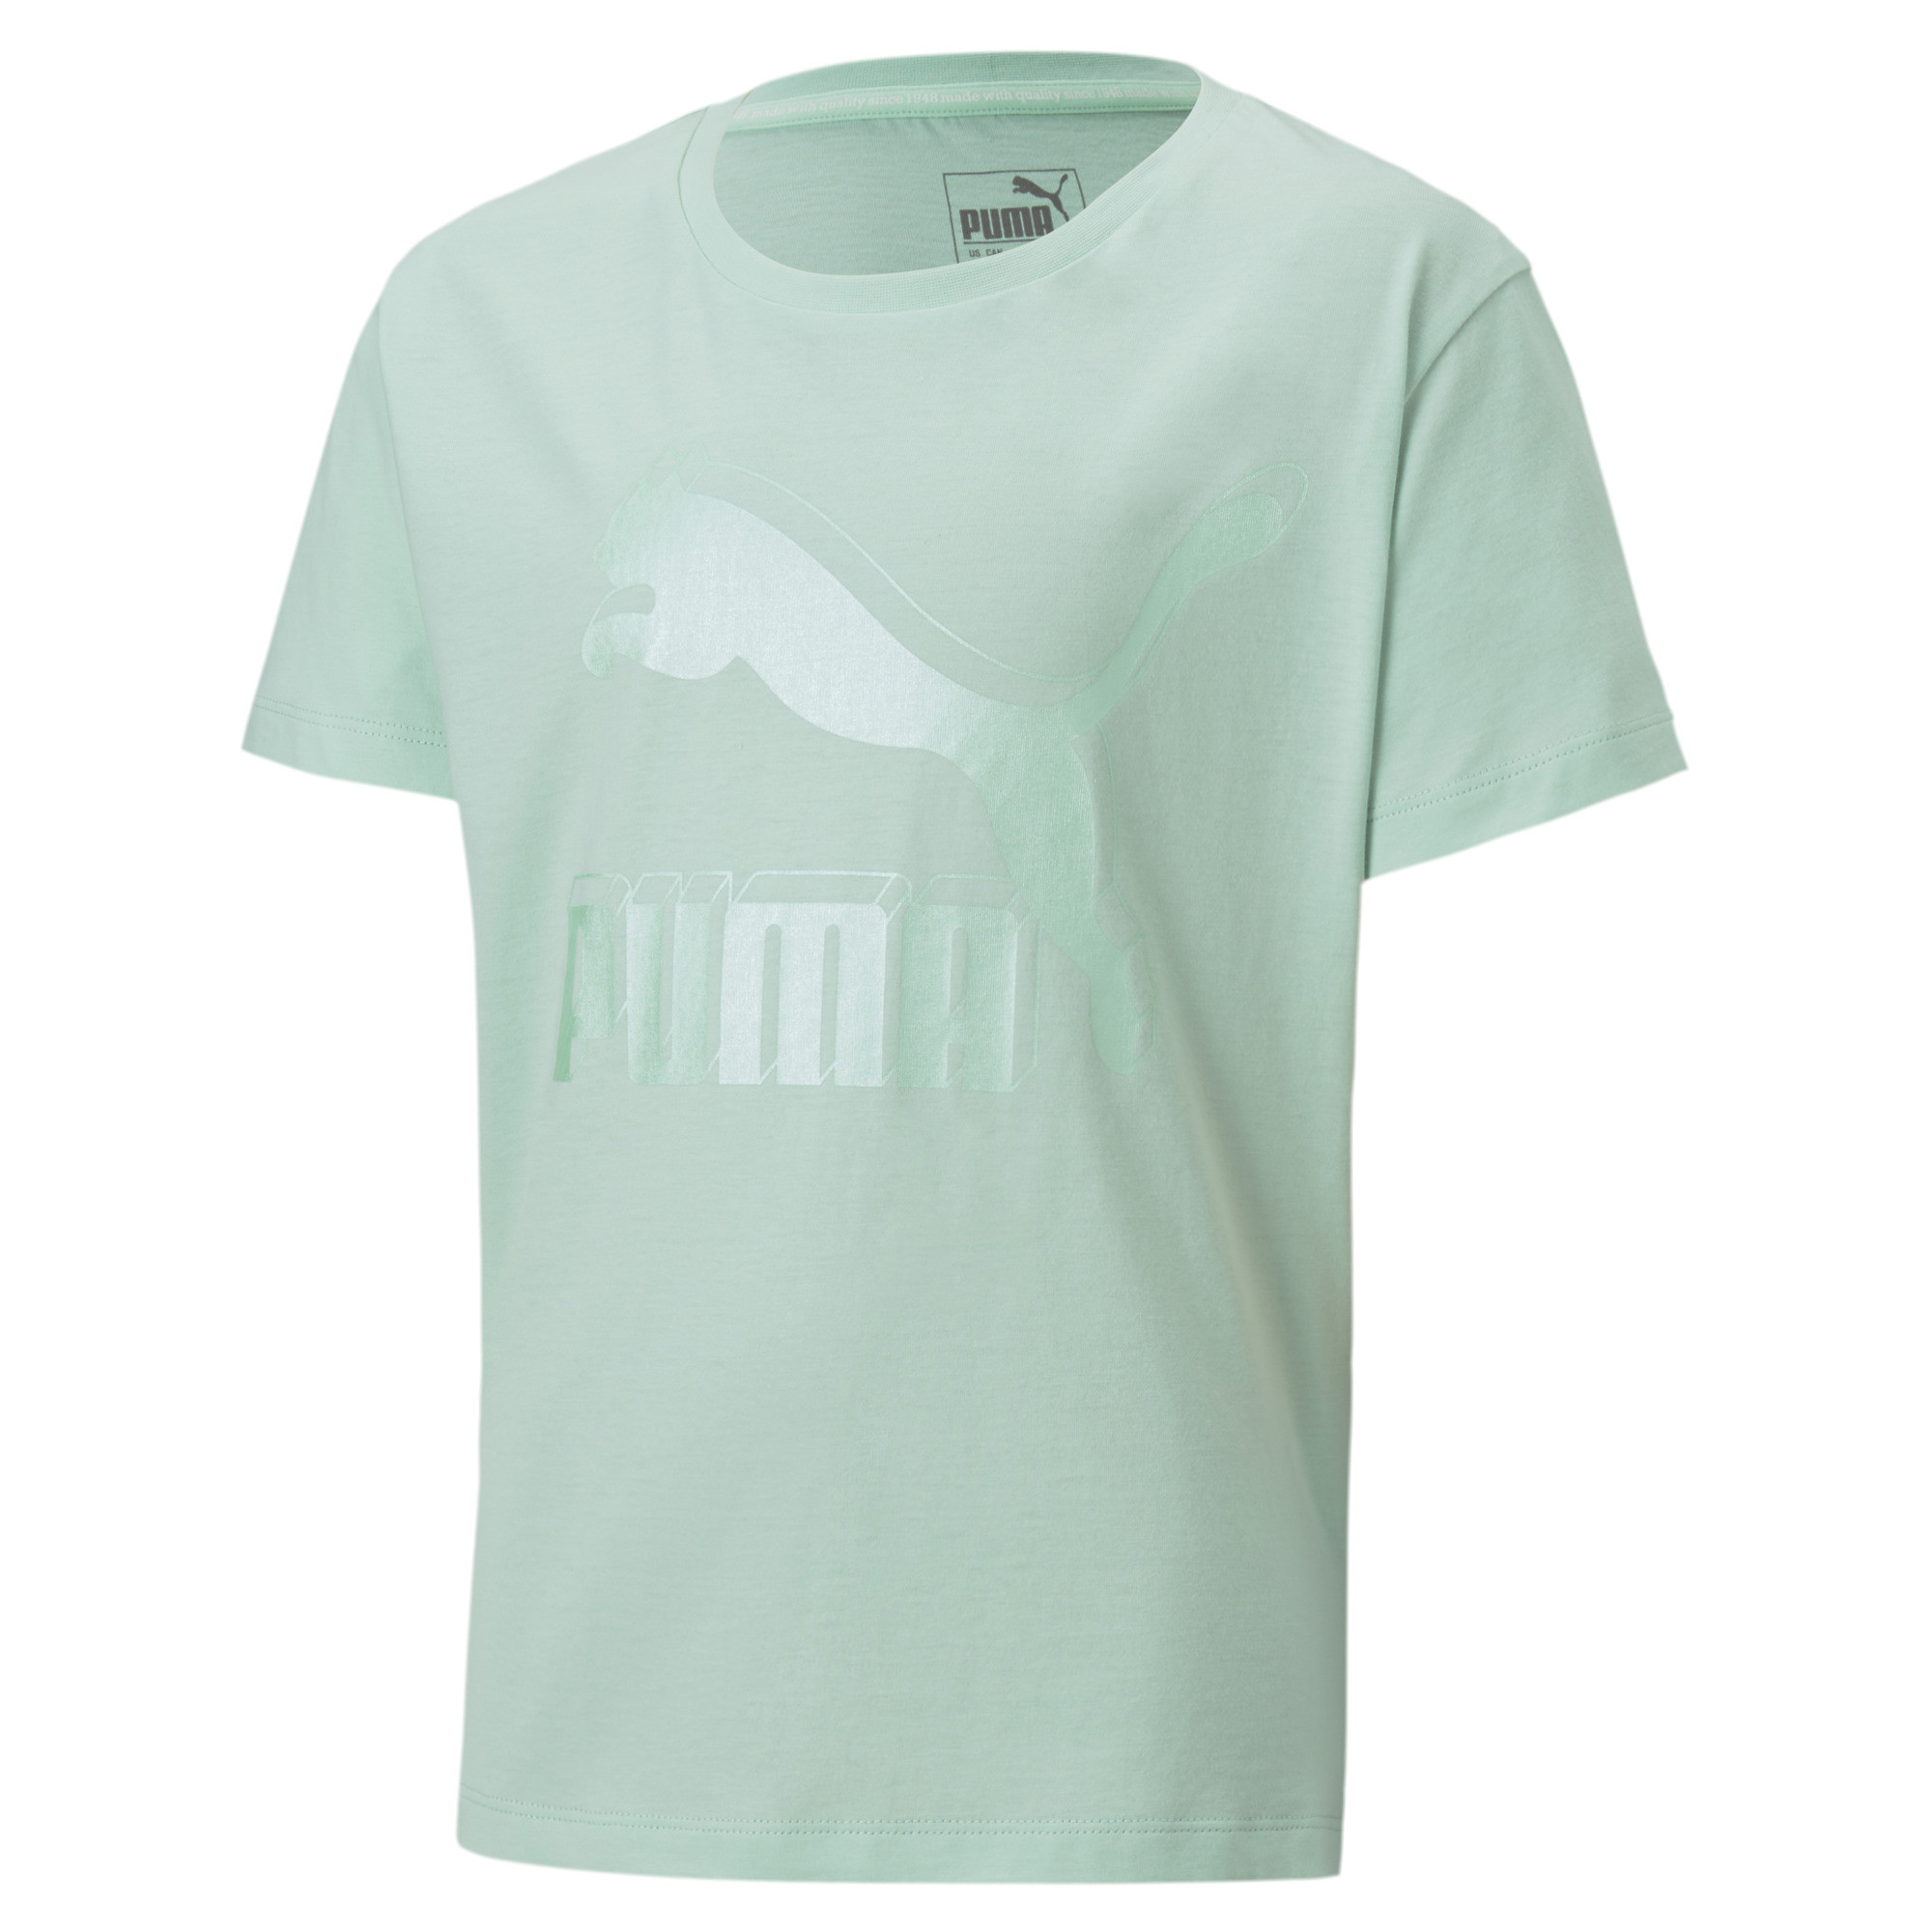 PUMA Classics Graphic Mädchen T Shirt Mädchen T Shirt Kinder